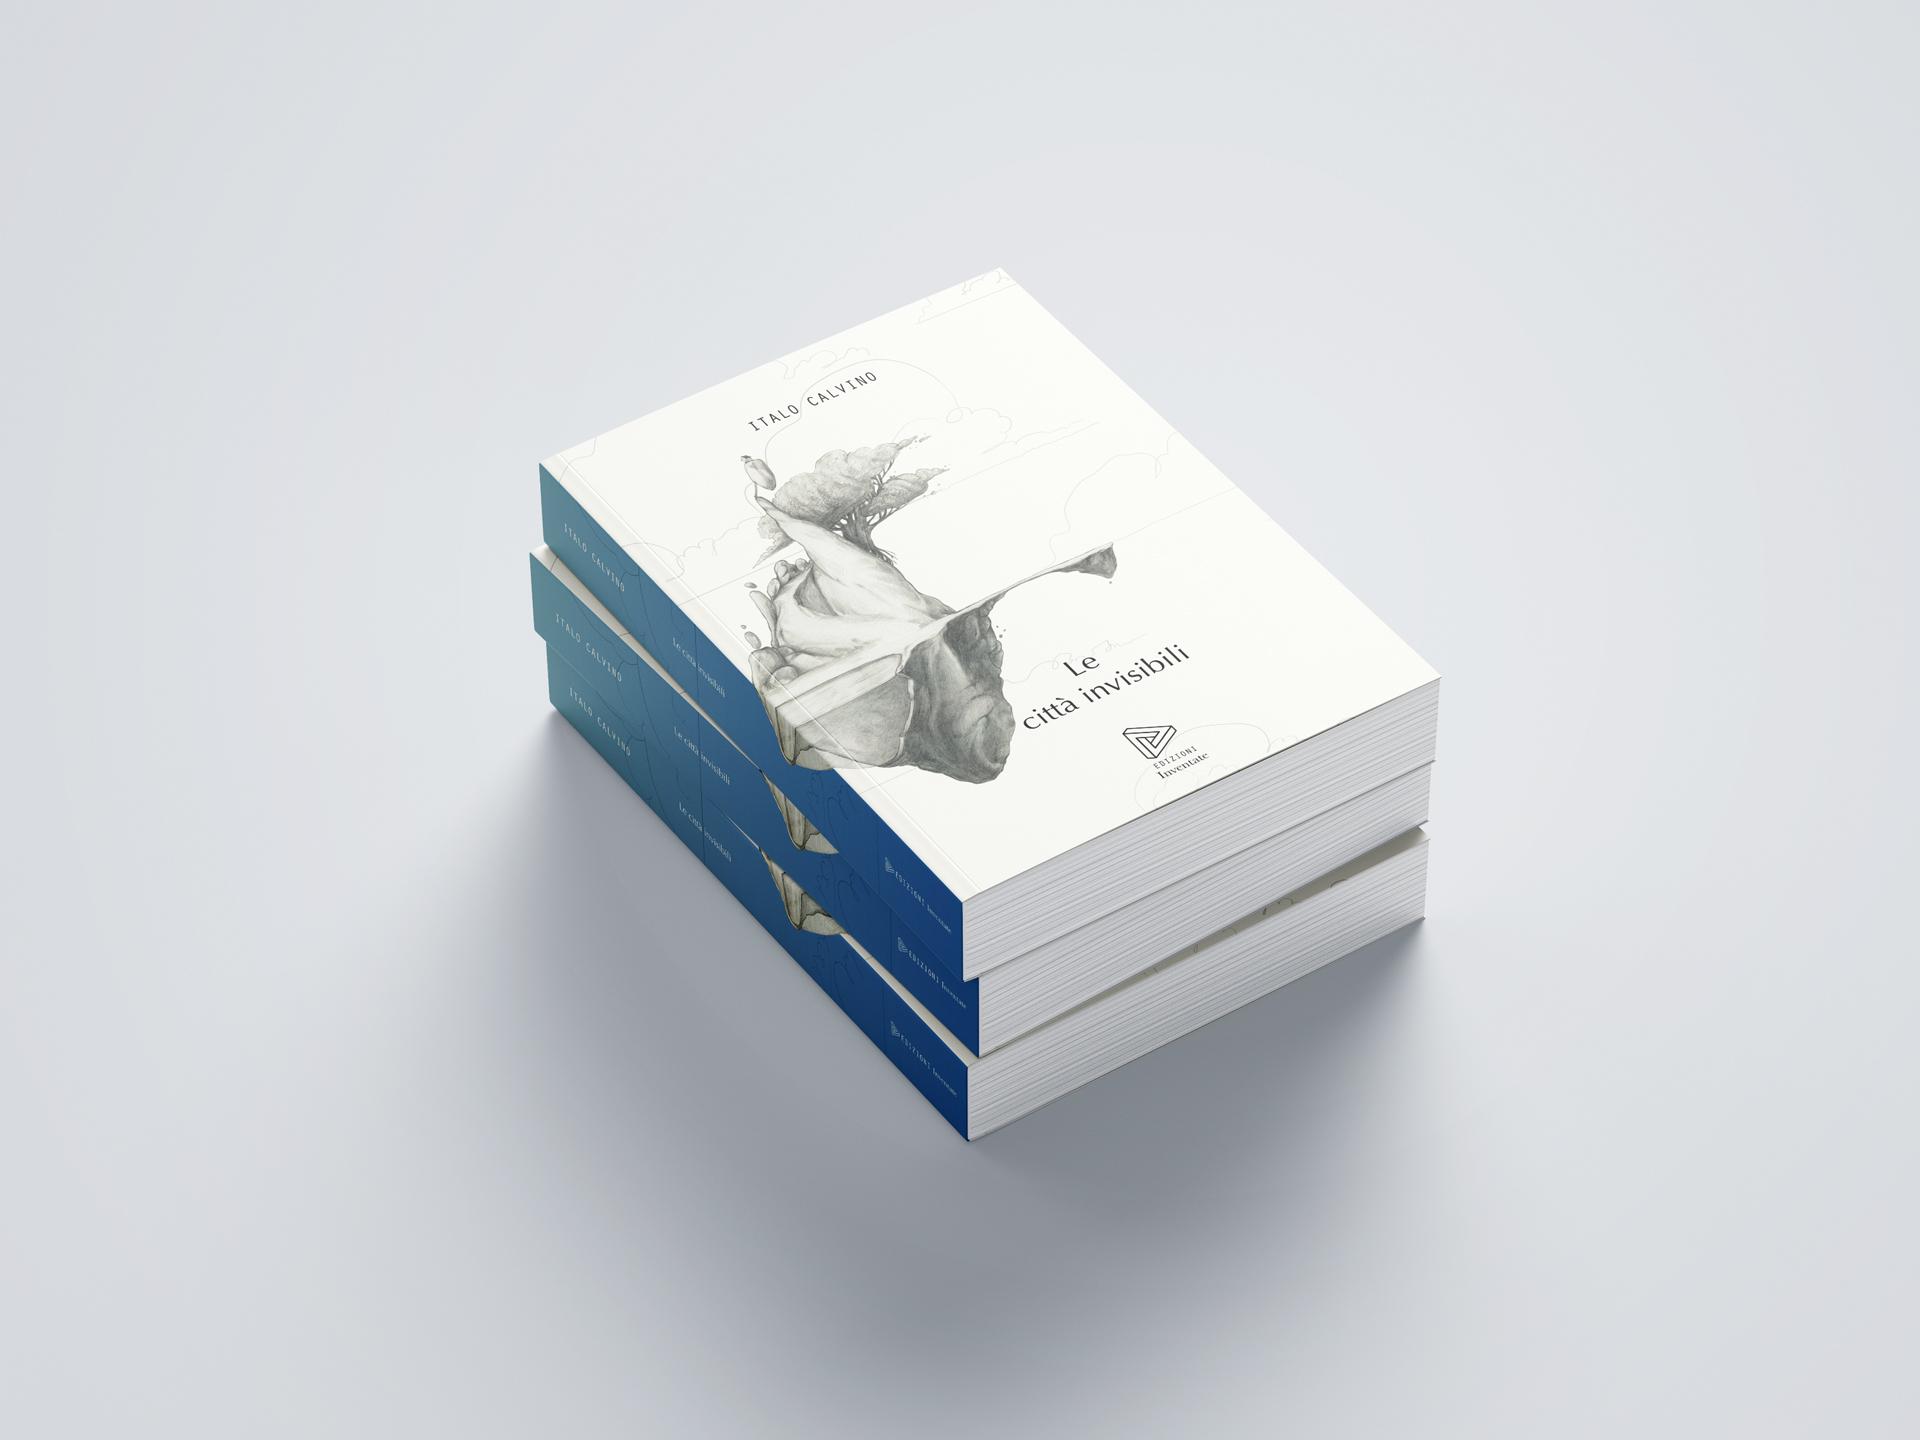 libro2-c